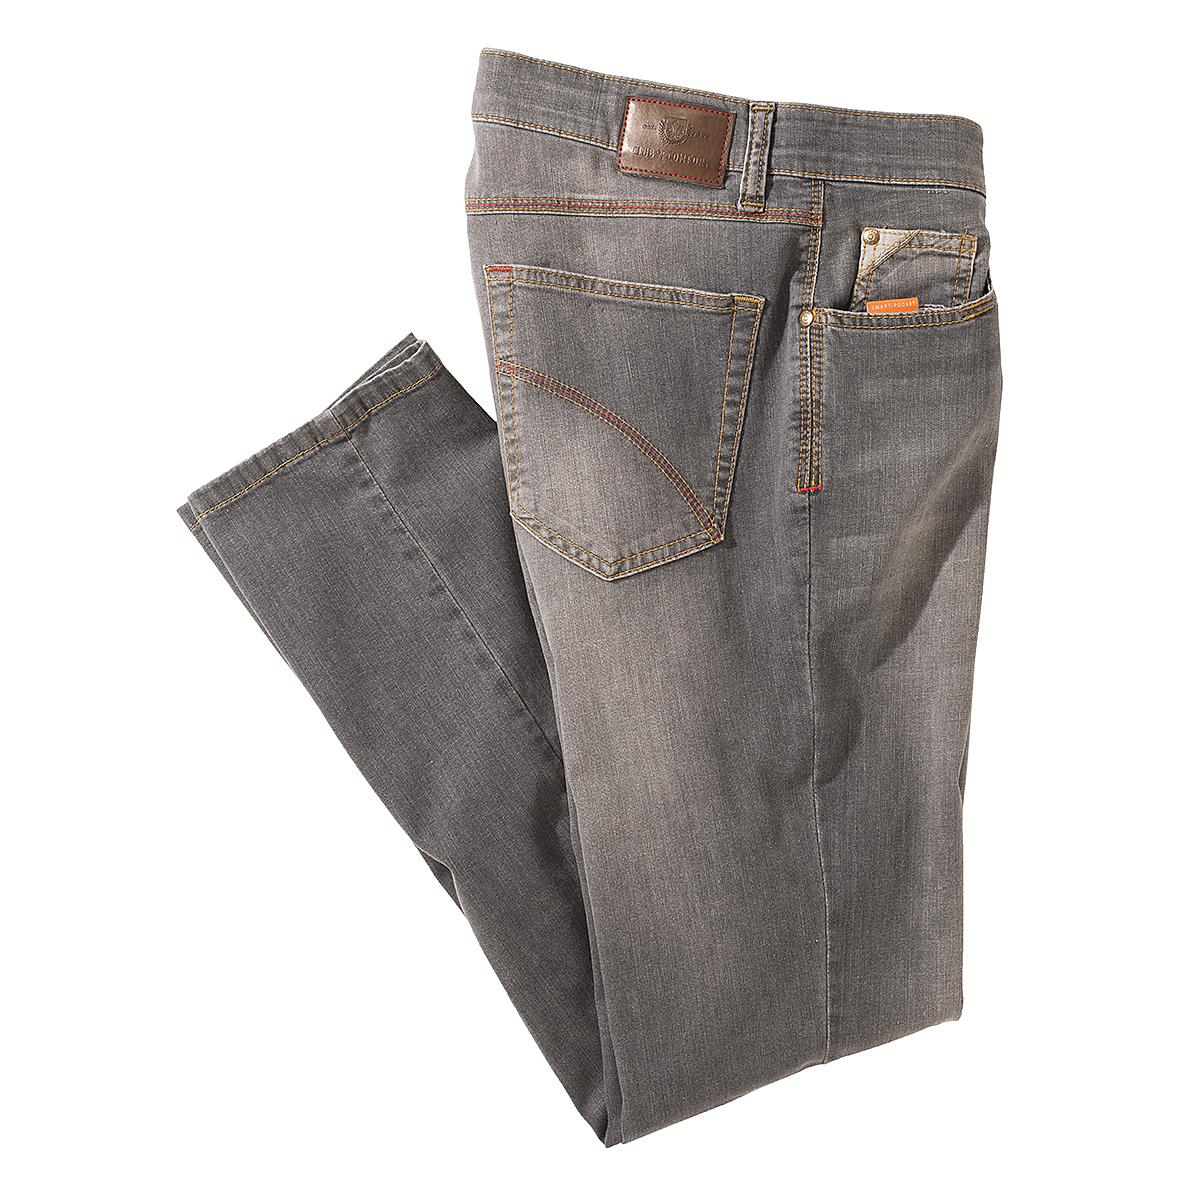 club of comfort highstretch denim 5 pocket jeans kurzleib grau gr enspezialist m nnermode. Black Bedroom Furniture Sets. Home Design Ideas